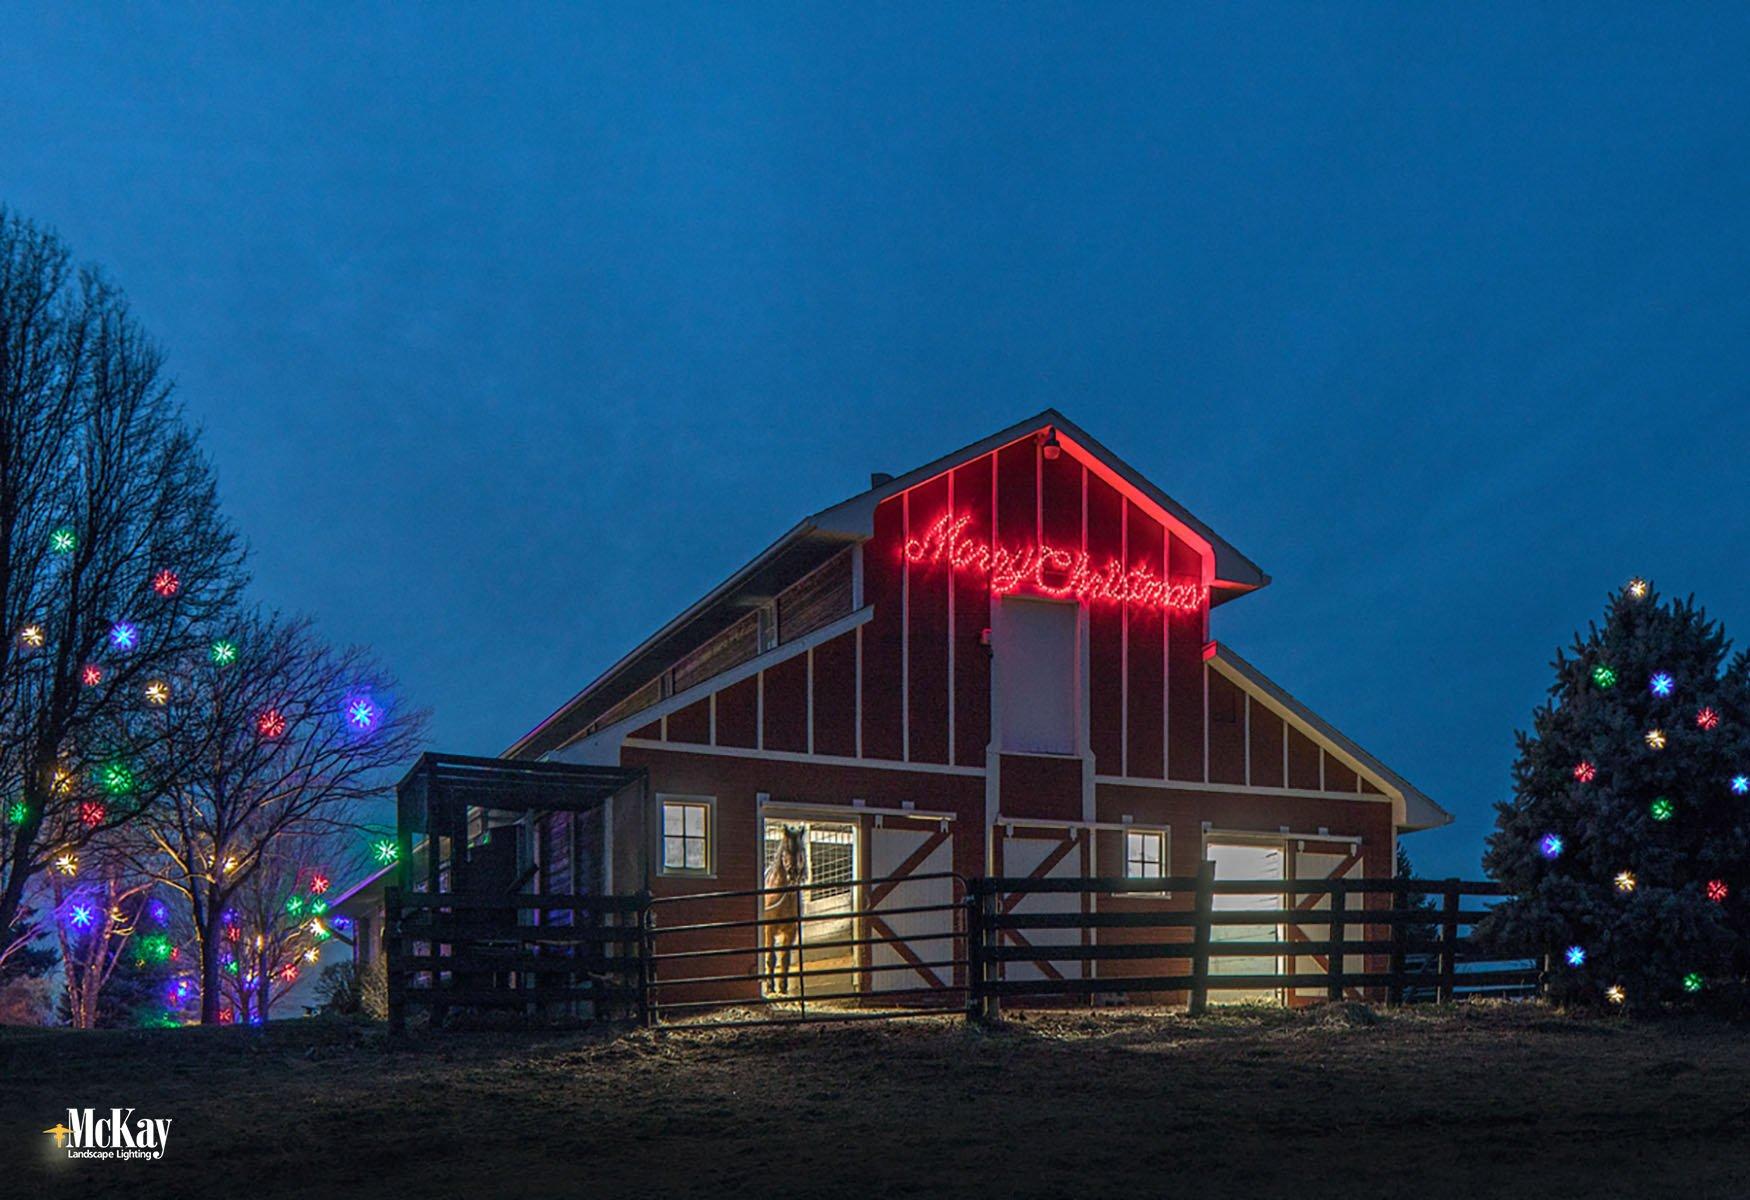 Holiday Christmas Lighting Omaha Nebraska McKay Landscape Lighting F 07-1